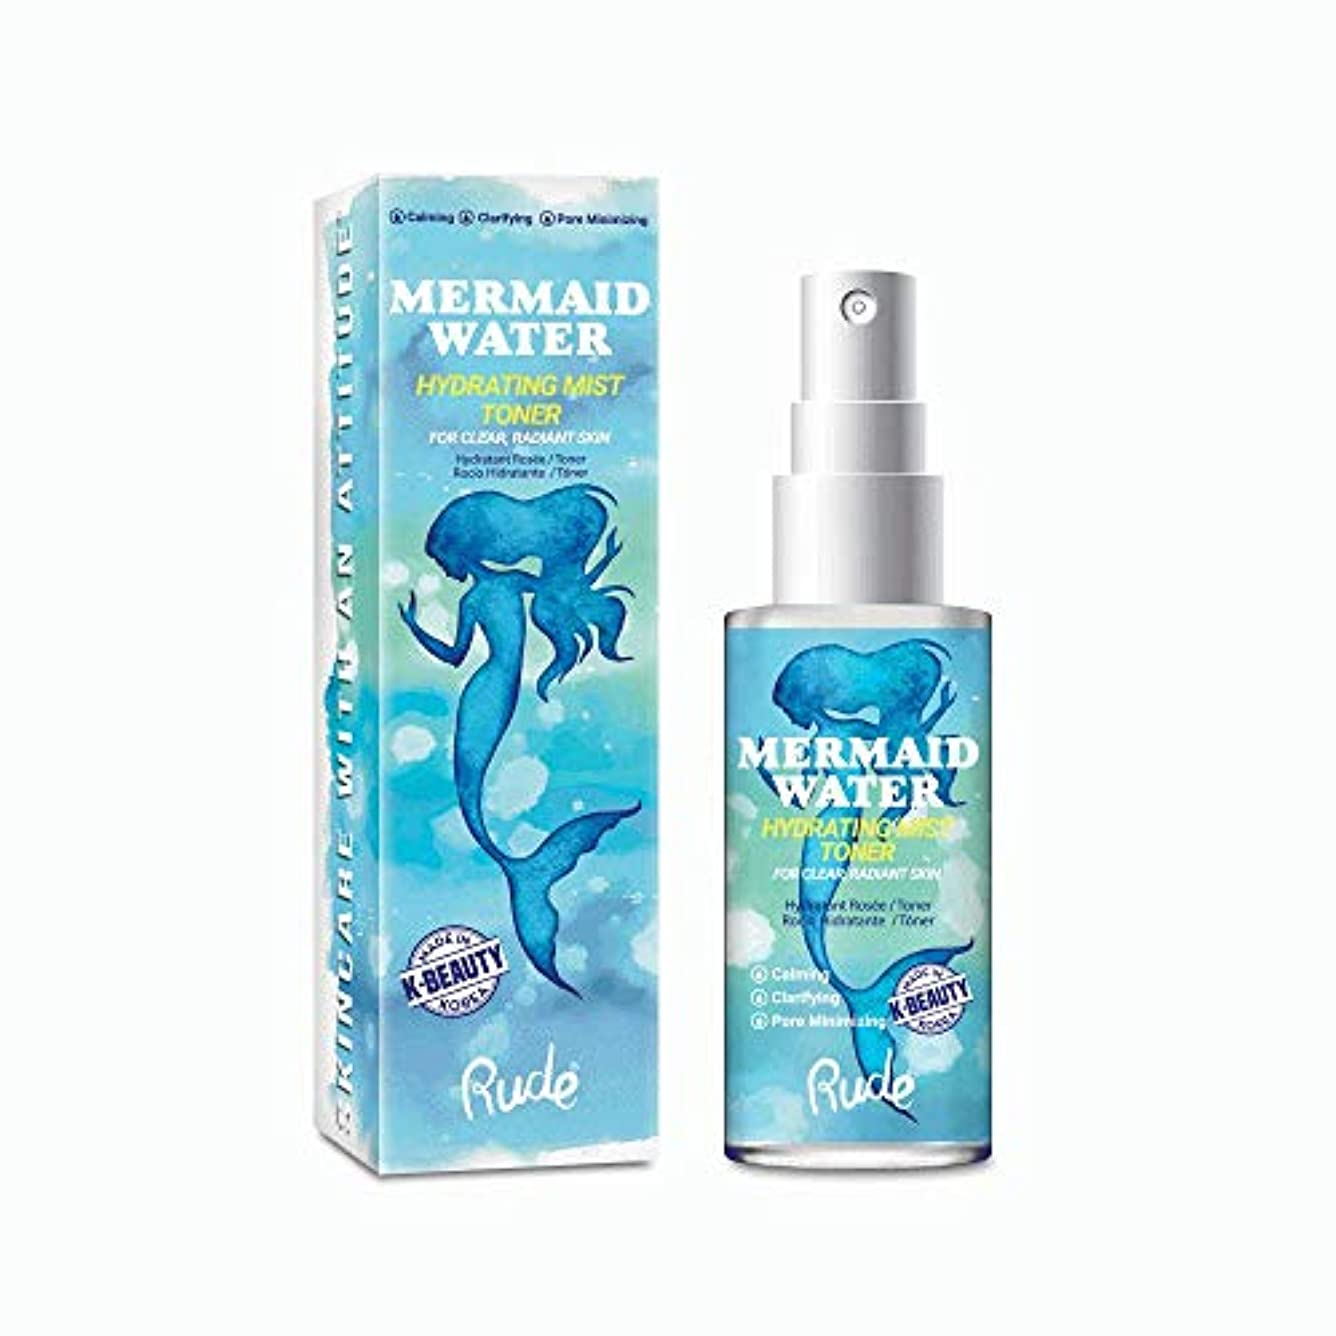 実用的修正褒賞(3 Pack) RUDE Mermaid Water Hydrating Mist Toner (並行輸入品)